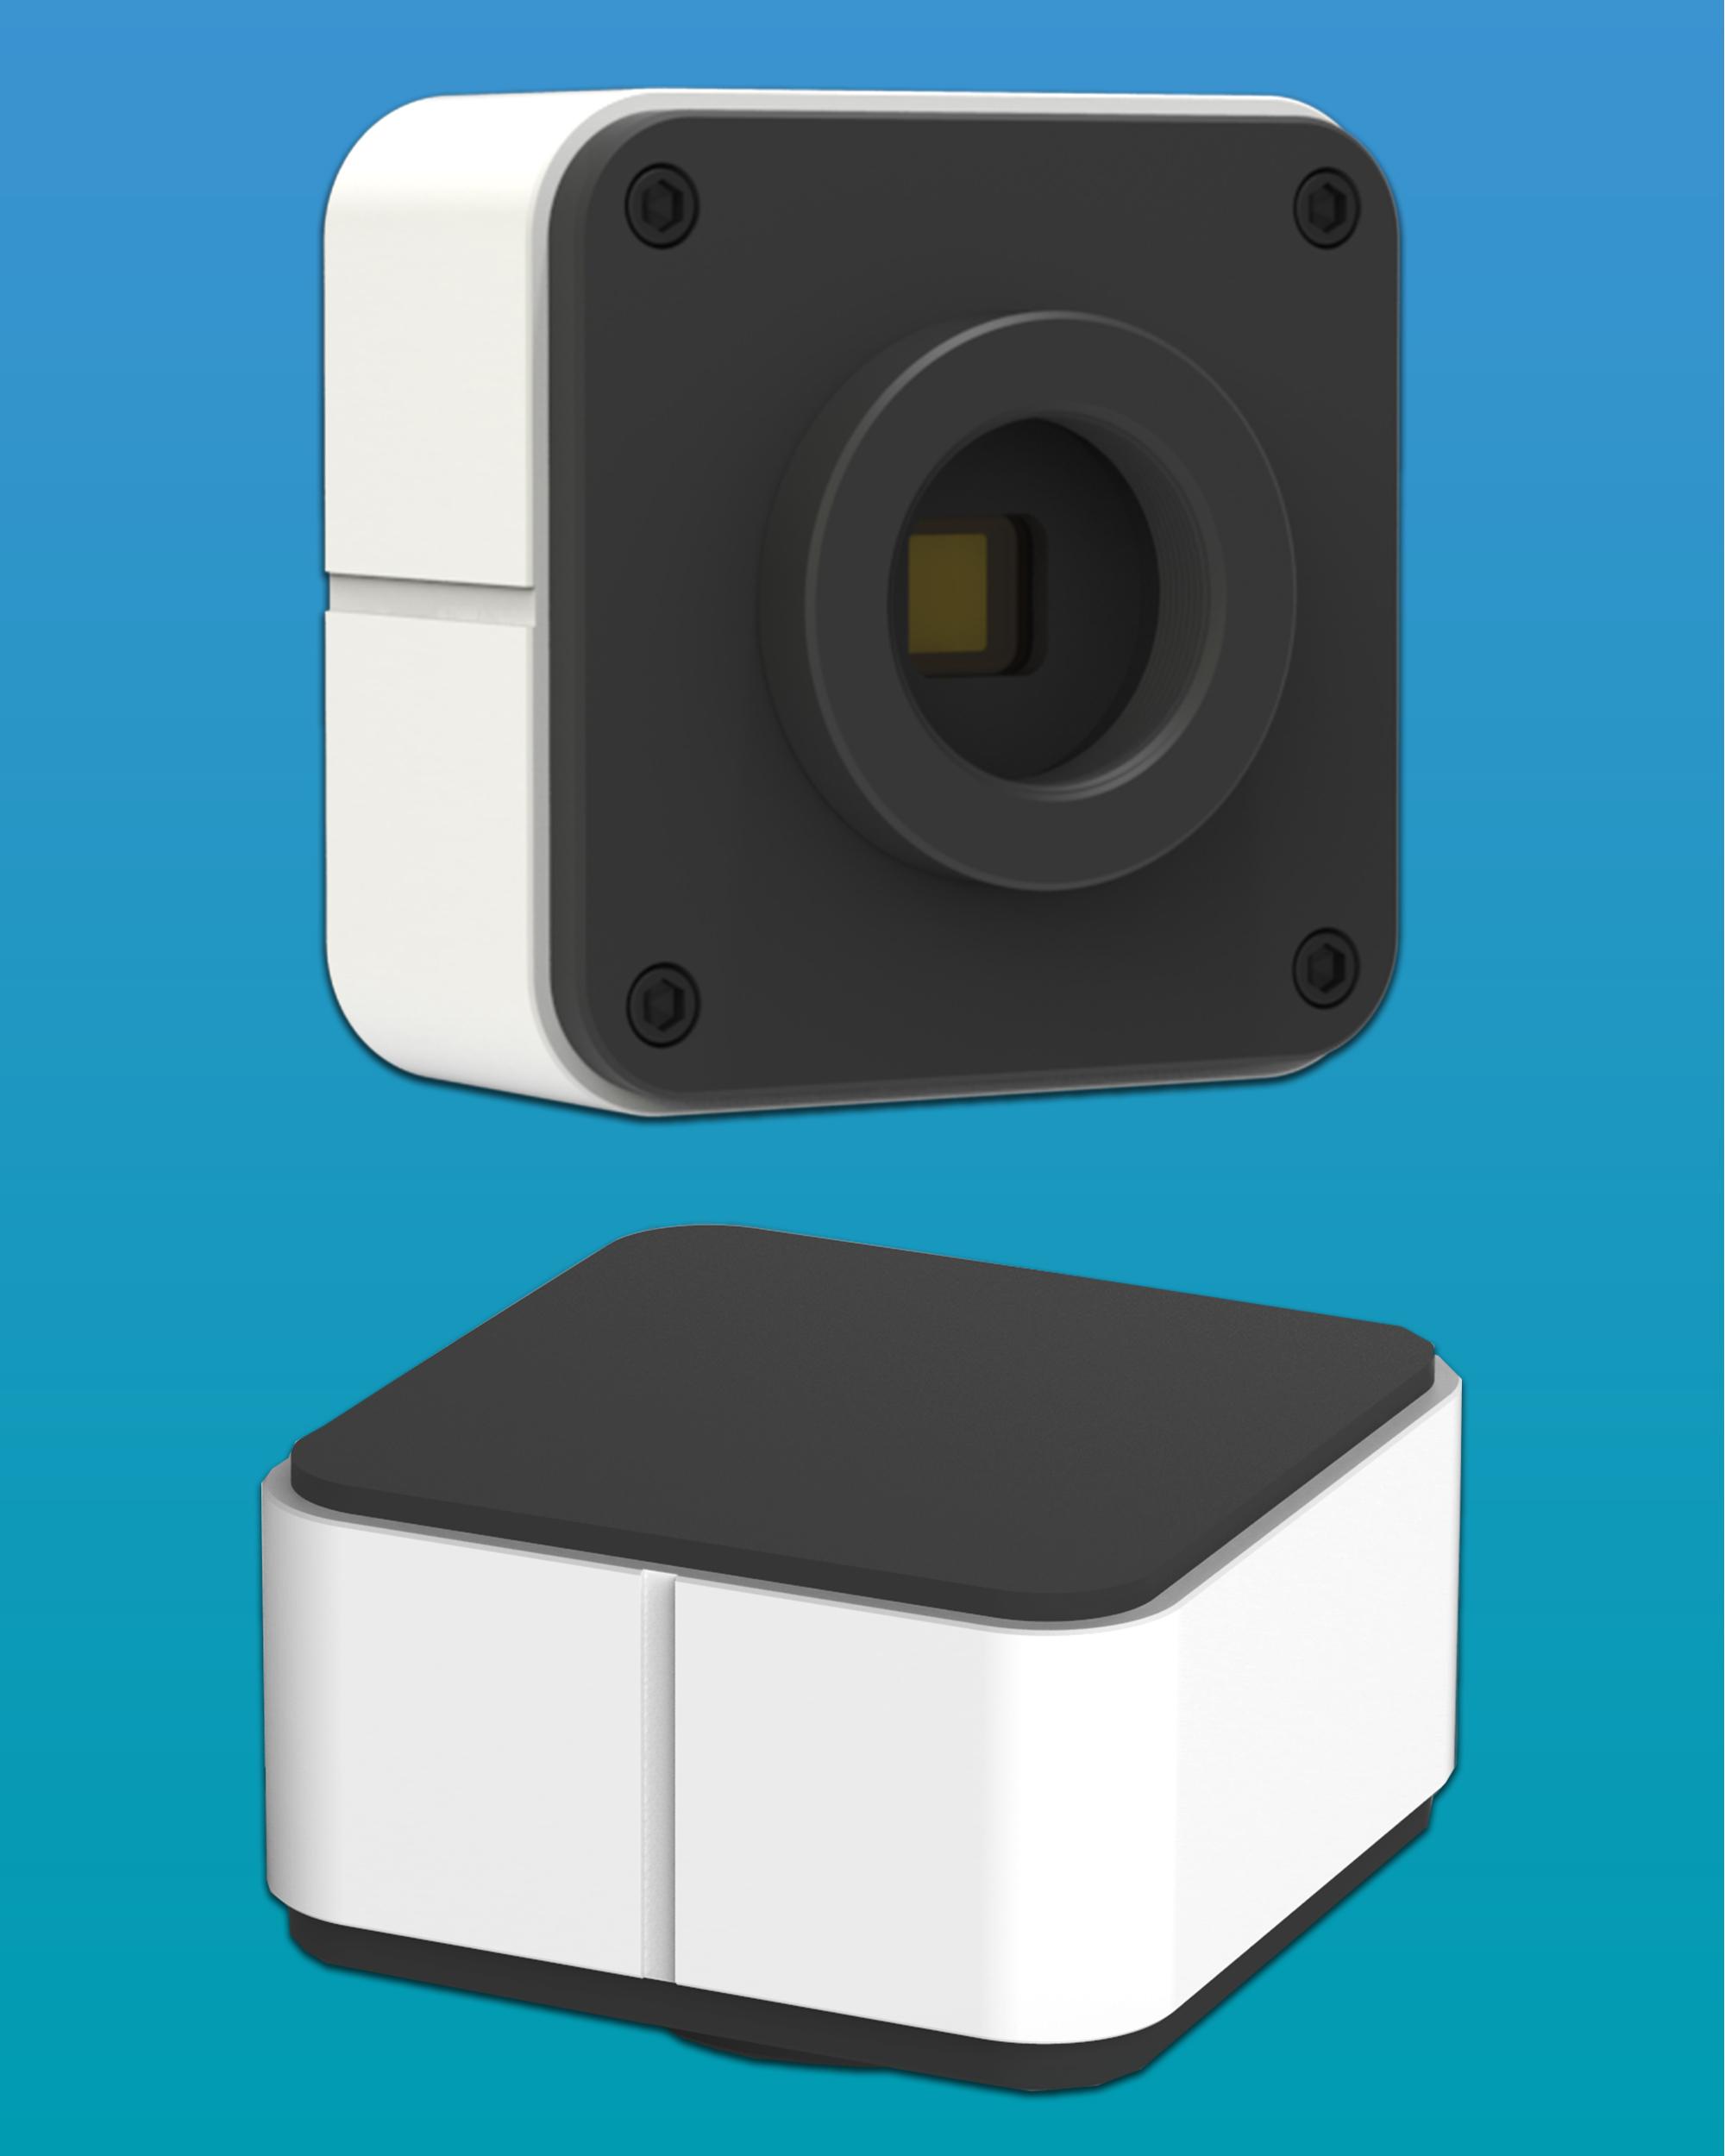 [LC-35] 5MP USB2.0 Graphics Accelerated Microscope Camera